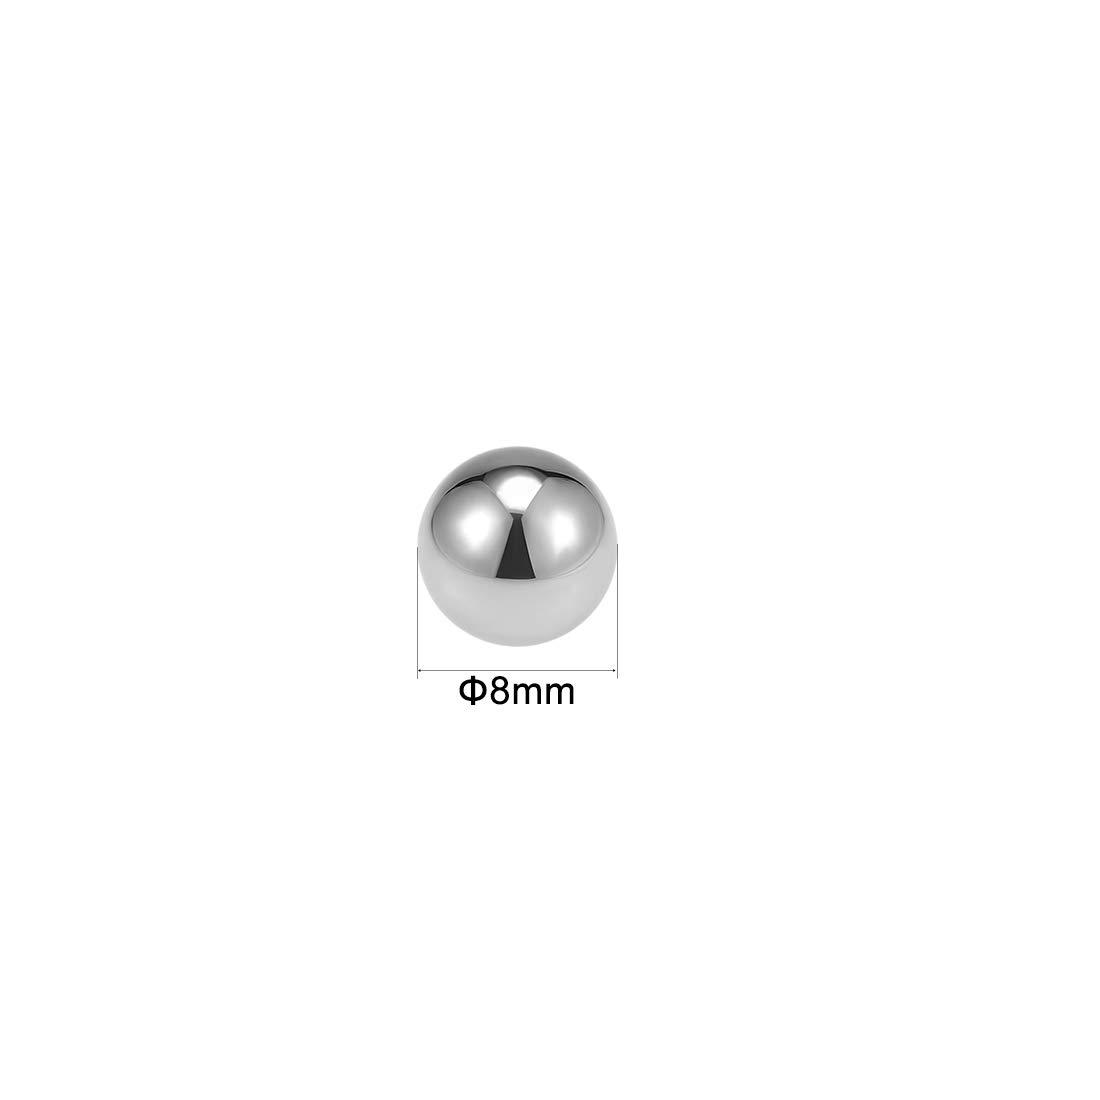 uxcell Bearing Balls 15mm Chrome Steel G25 Precision 60-63 HRC 20pcs